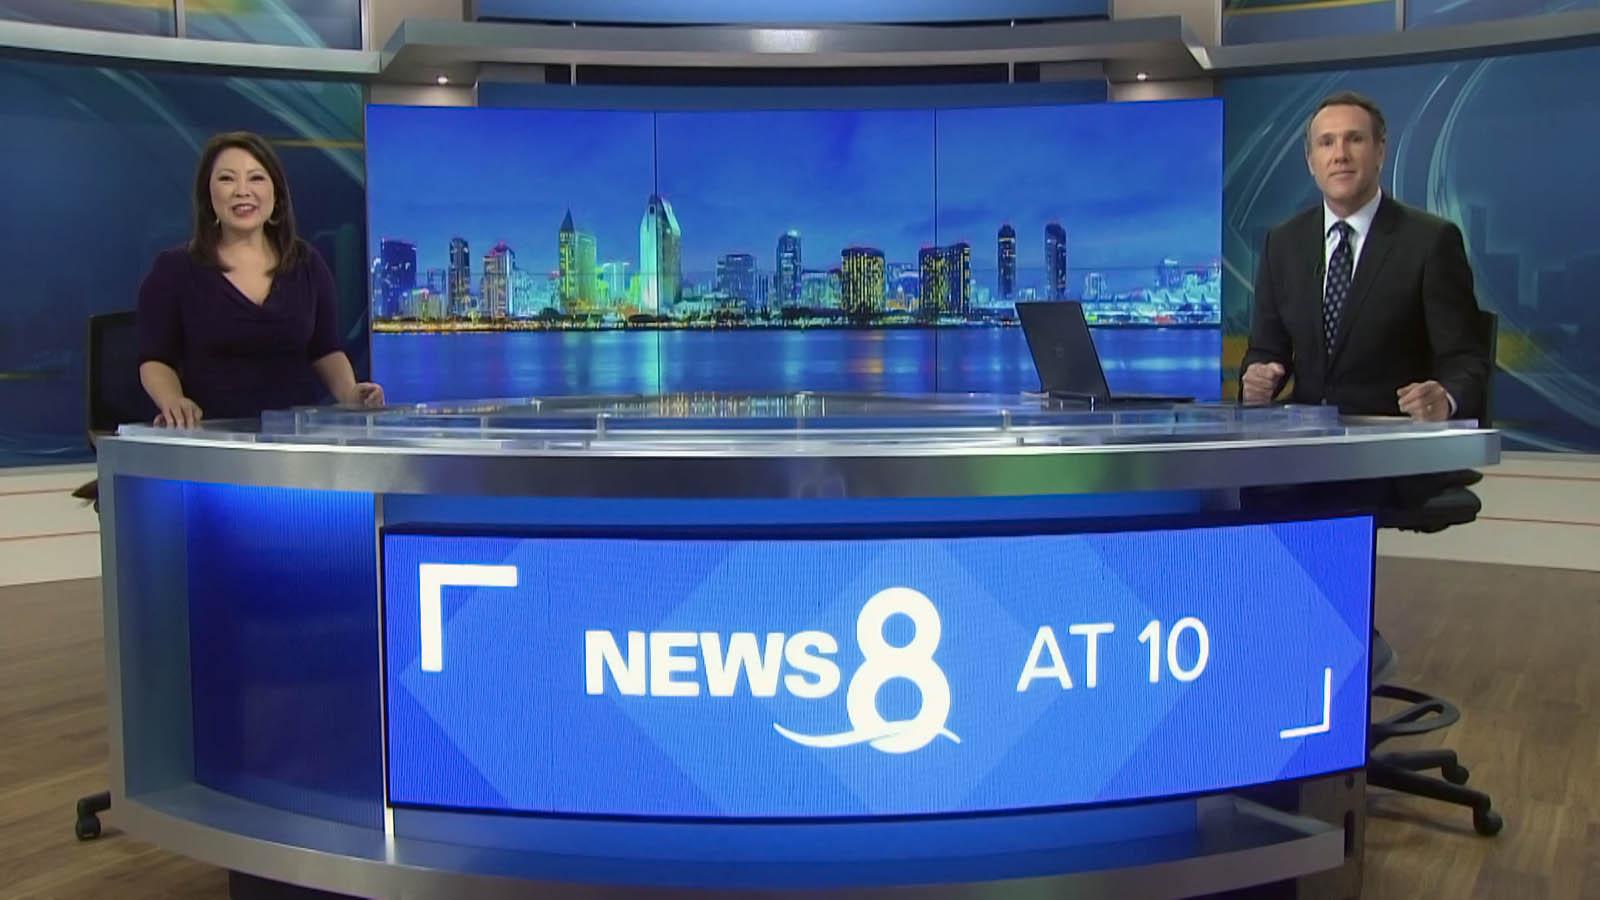 News 8 San Diego newscasters